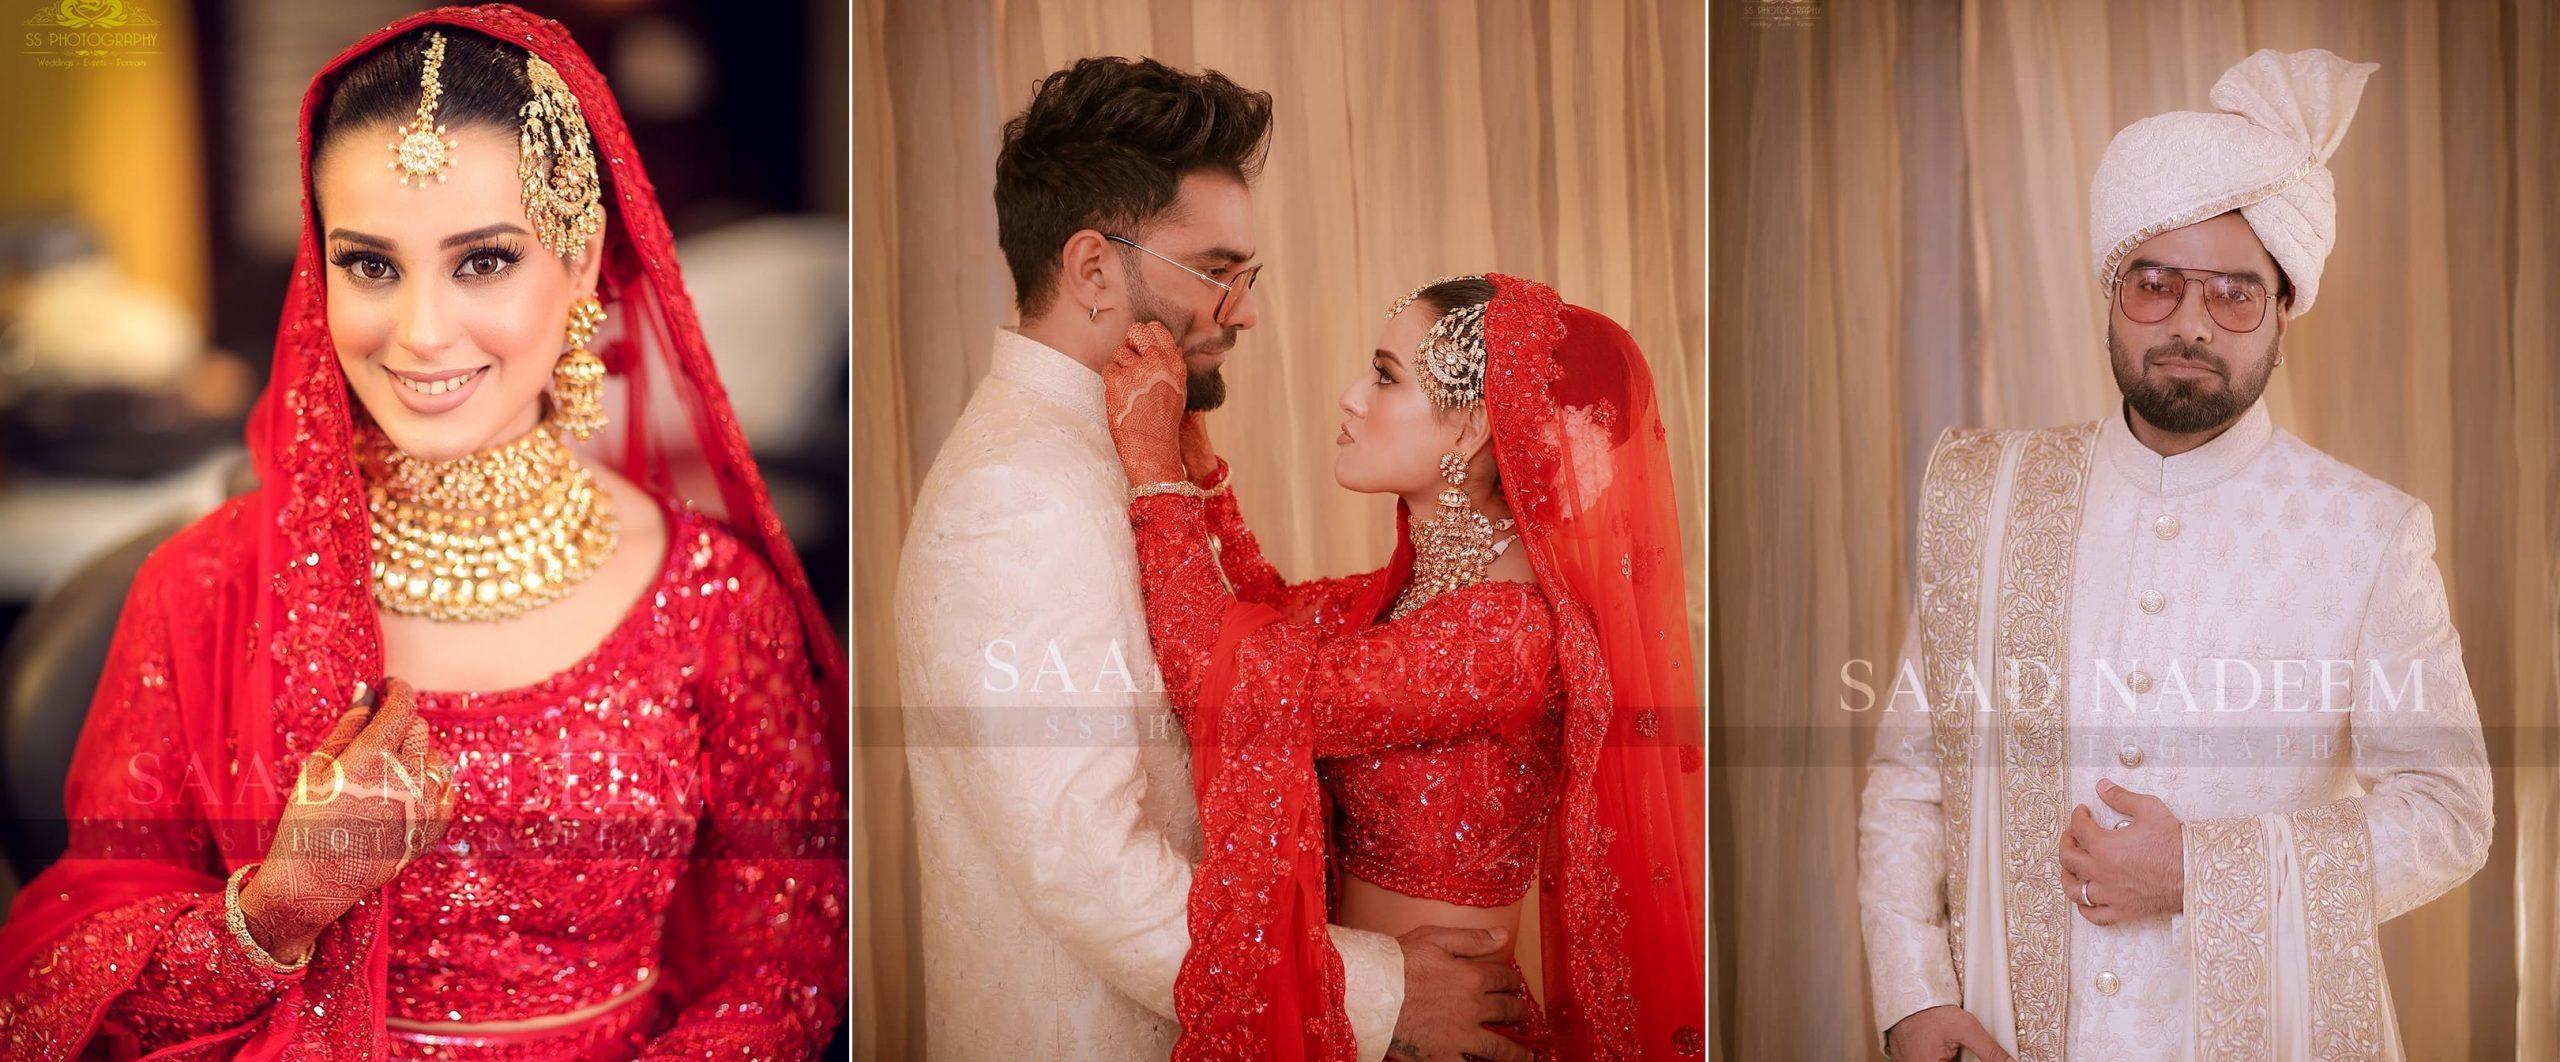 Iqra Aziz and Yasir Hussain Wedding Pictures (2)